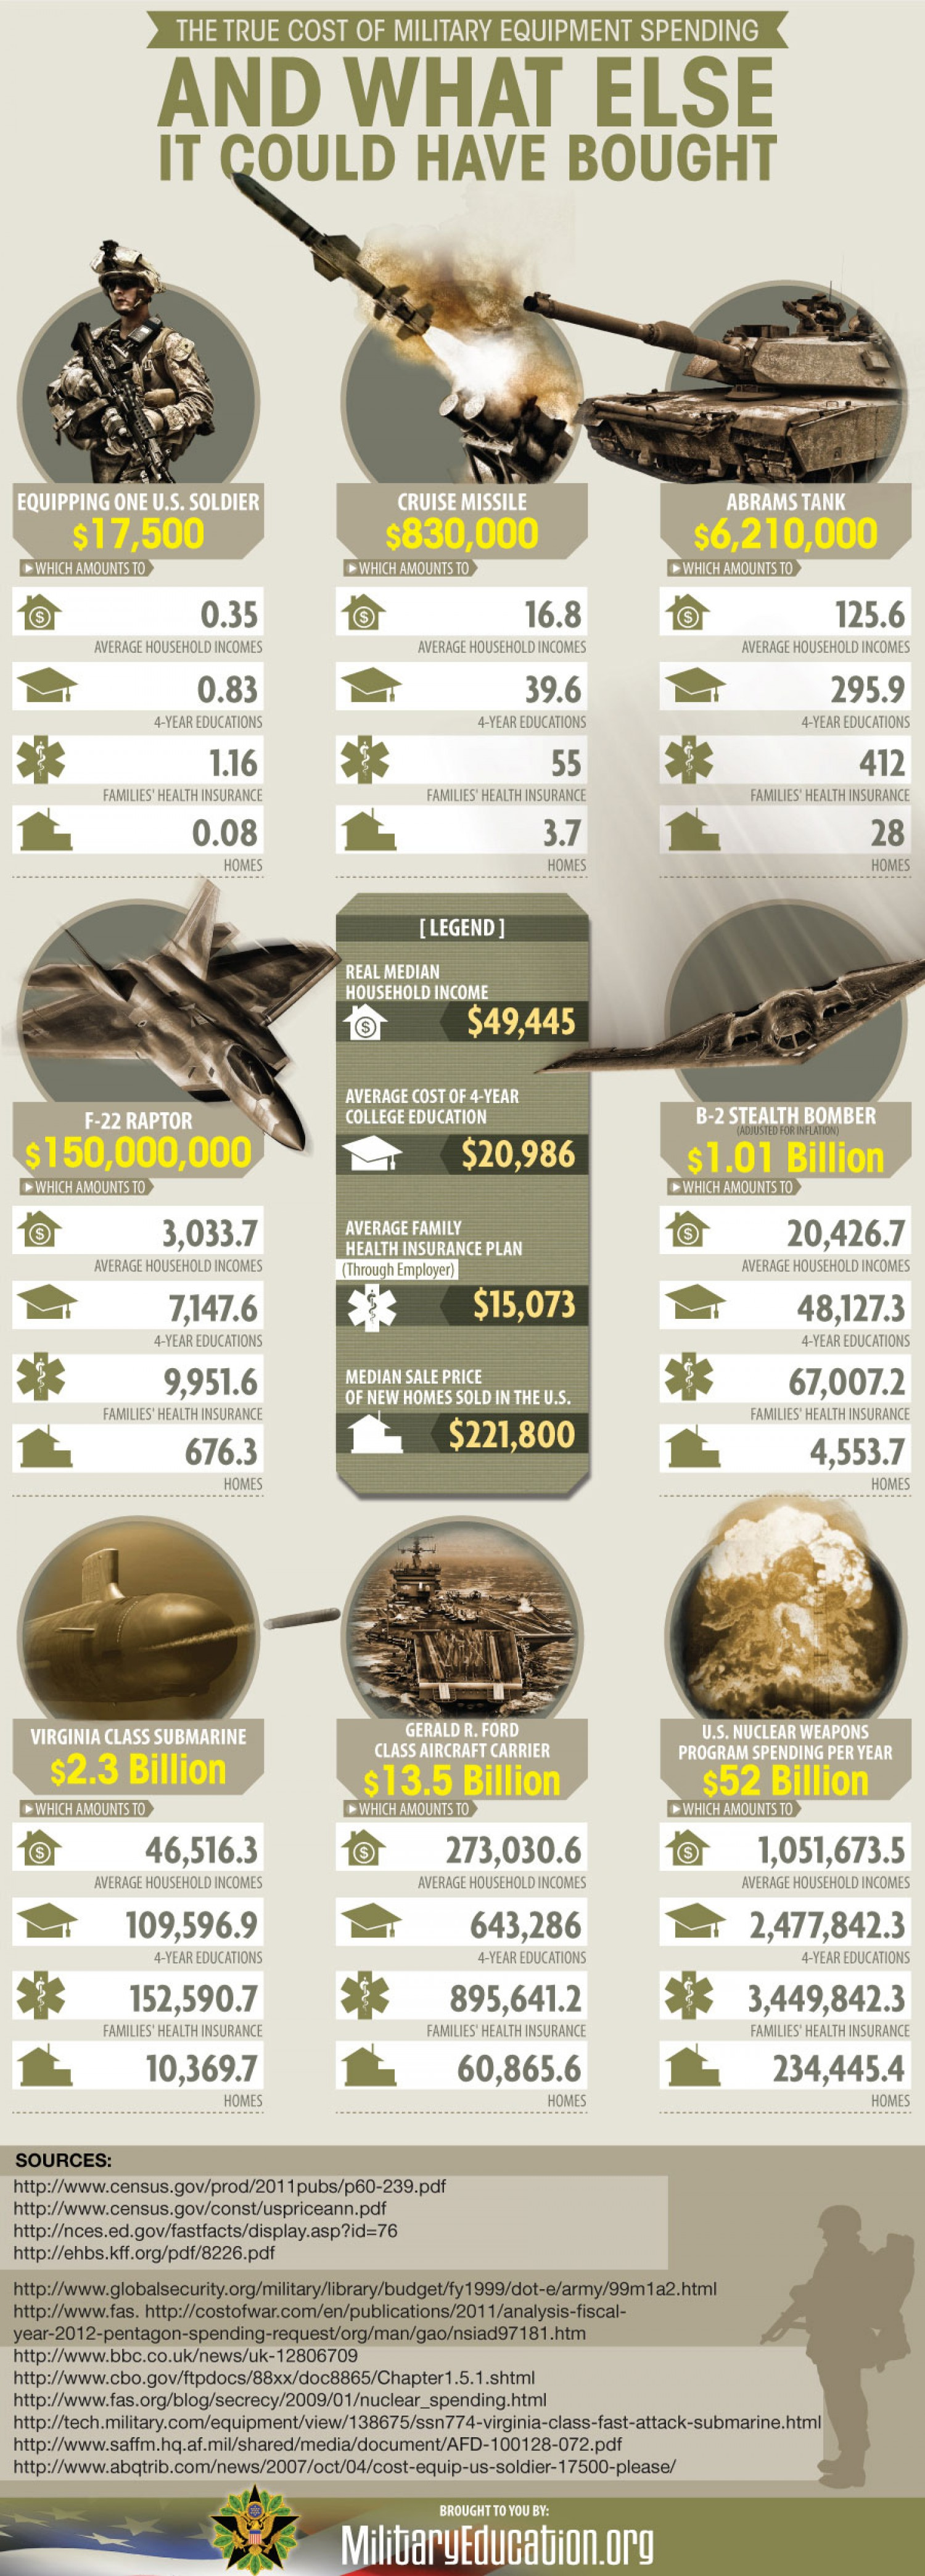 12. True cost of military equipment spending